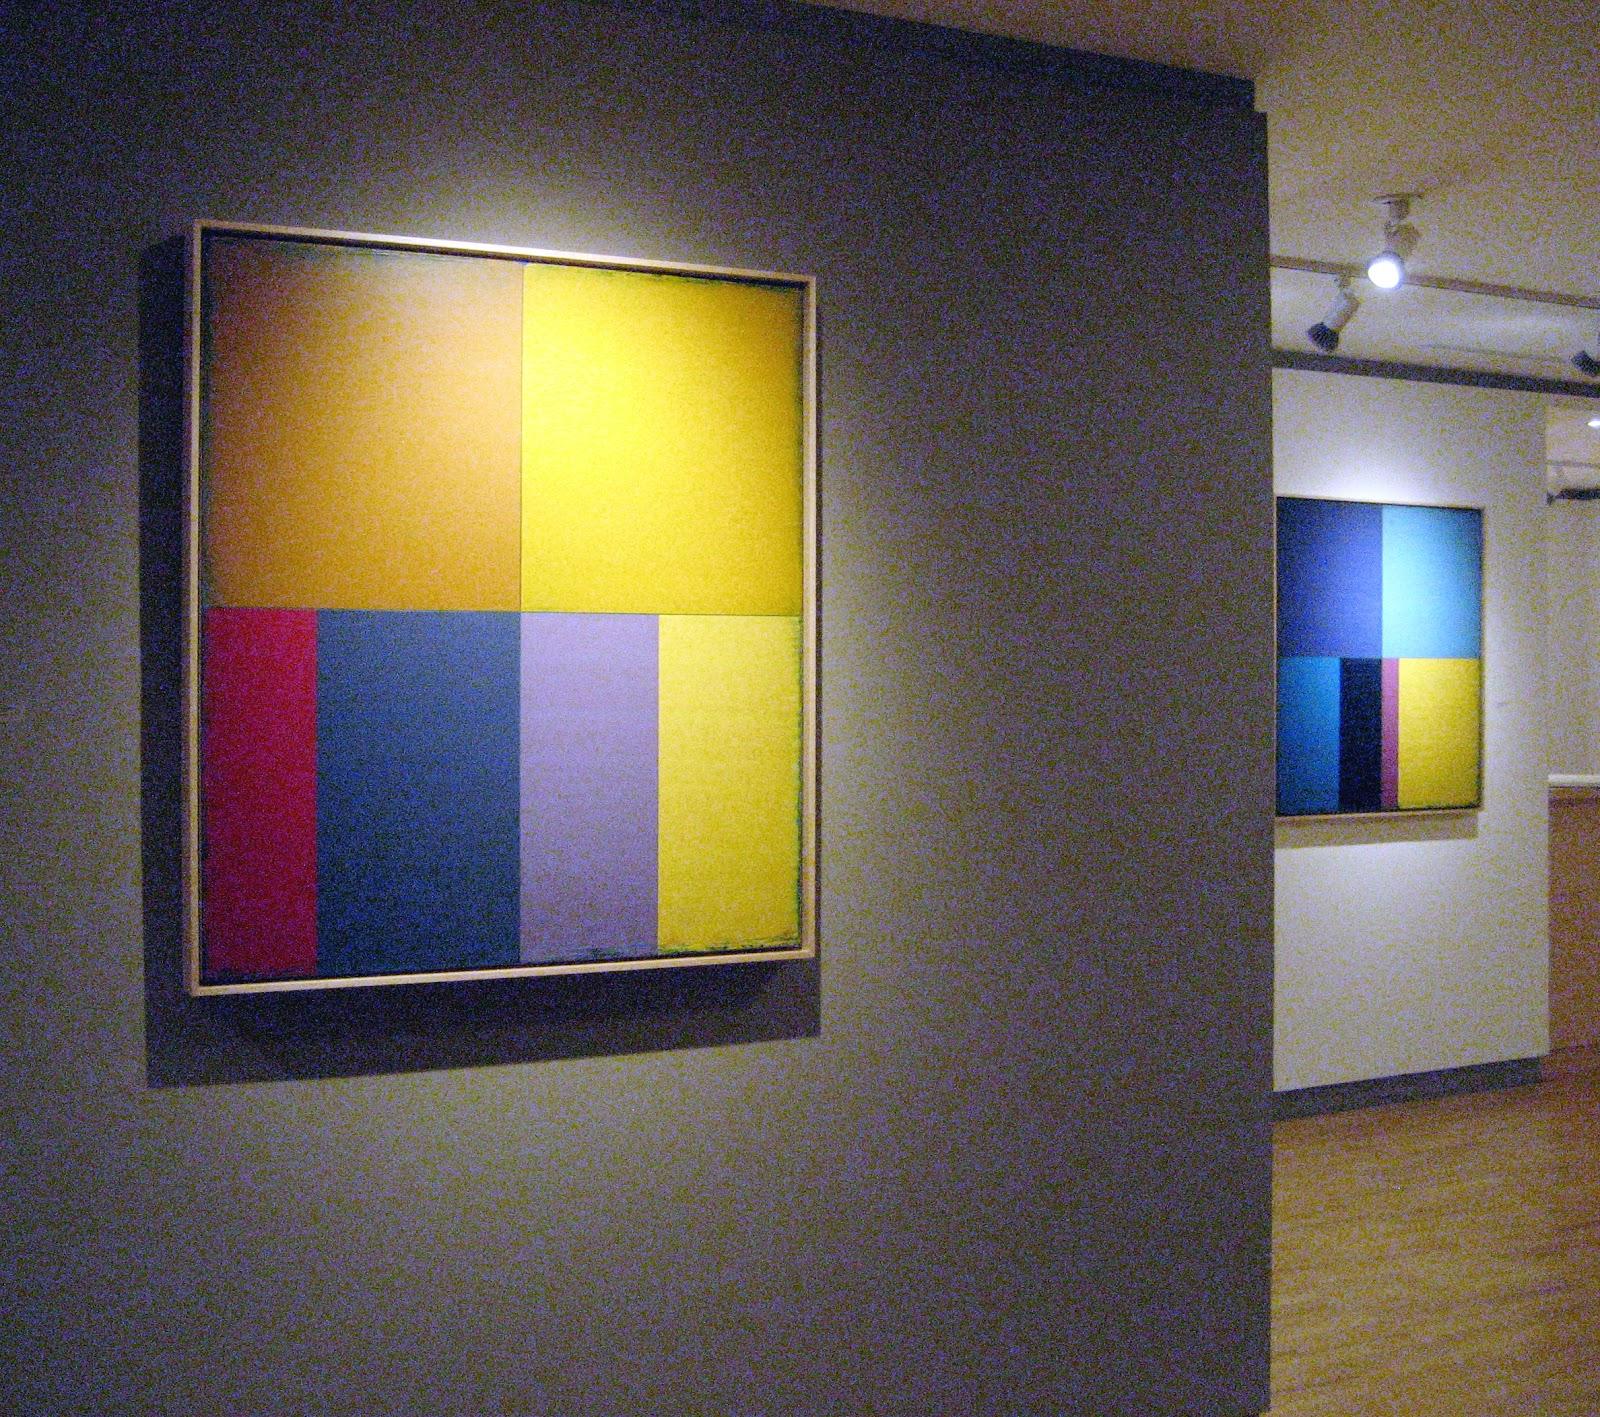 Joanne Mattera Art Blog: Building Geometry: Steven Alexander,